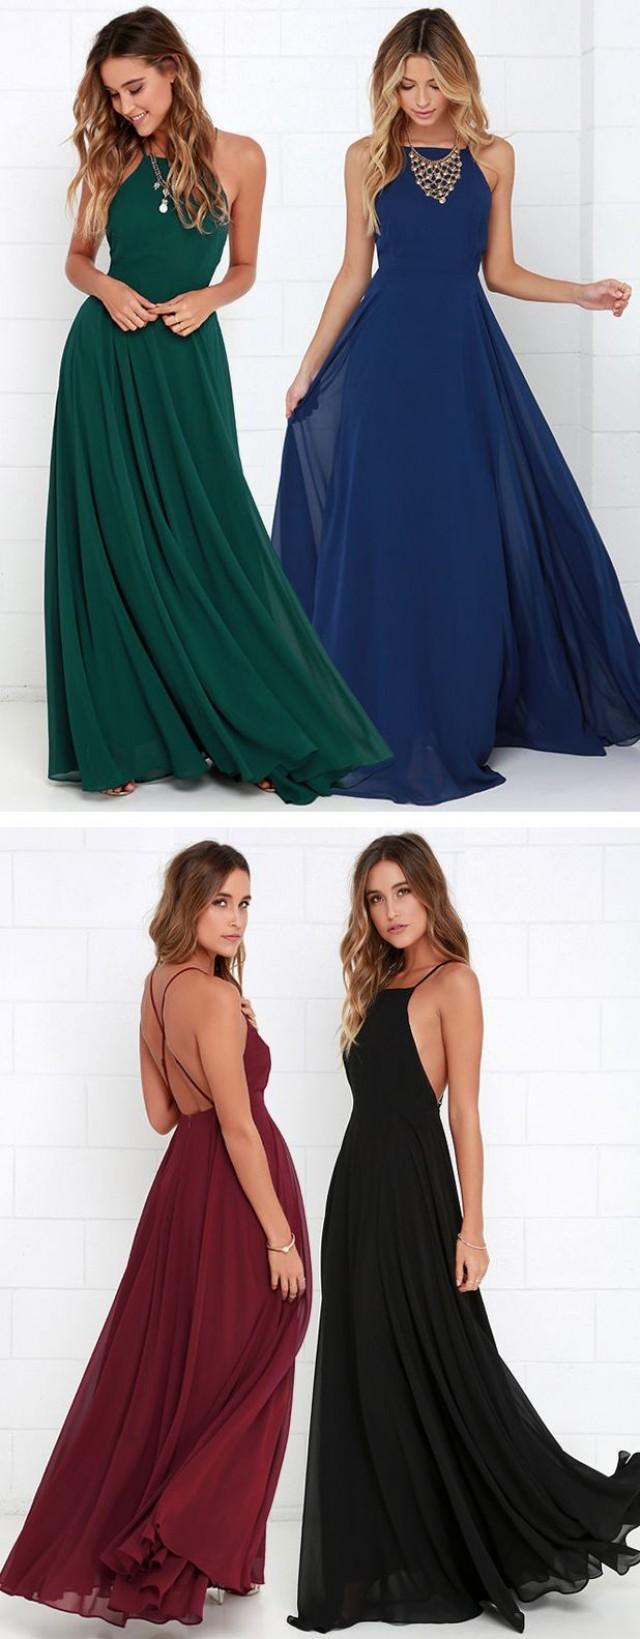 0c2179776463e Mythical Kind Of Love Dark Green Maxi Dress #2479928 - Weddbook